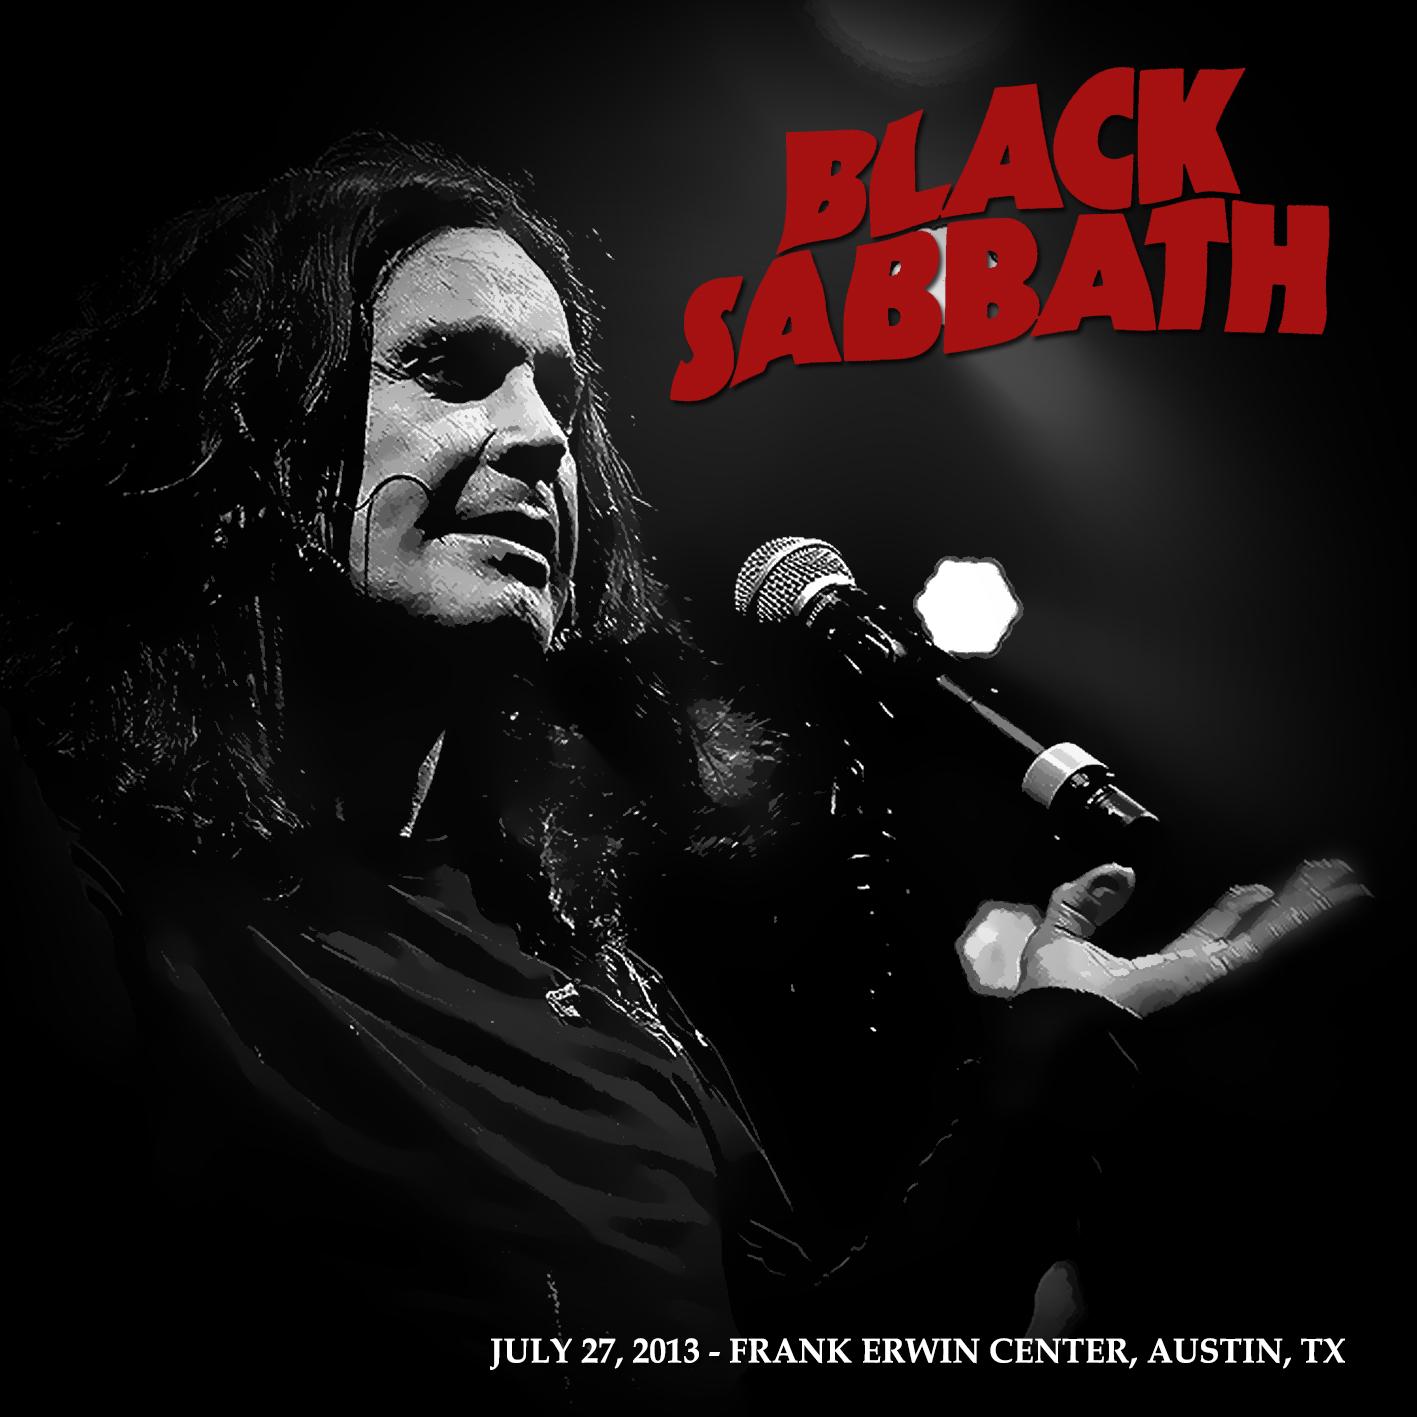 black sabbath 2013 07 27 austin tx epresley source guitars101 guitar forums. Black Bedroom Furniture Sets. Home Design Ideas